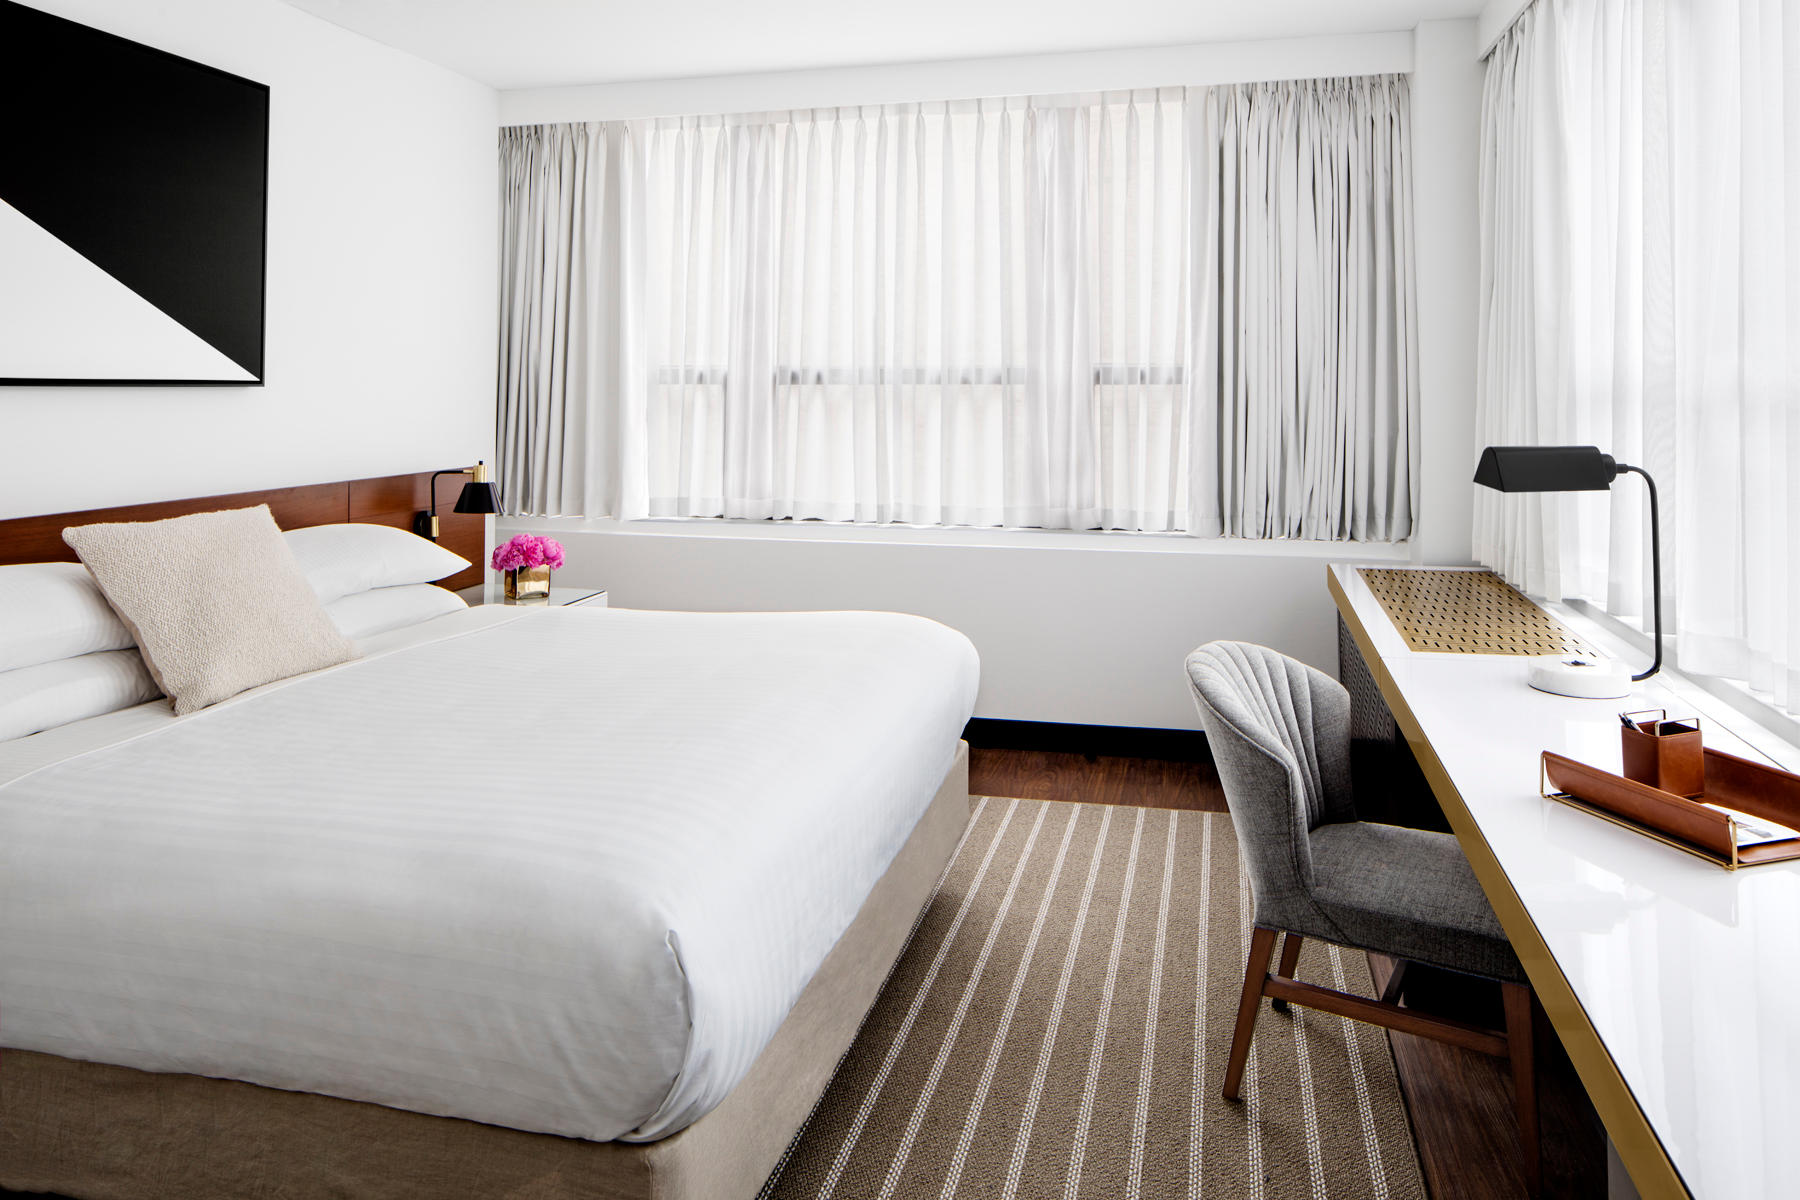 St. Gregory Hotel Dupont Circle image 20